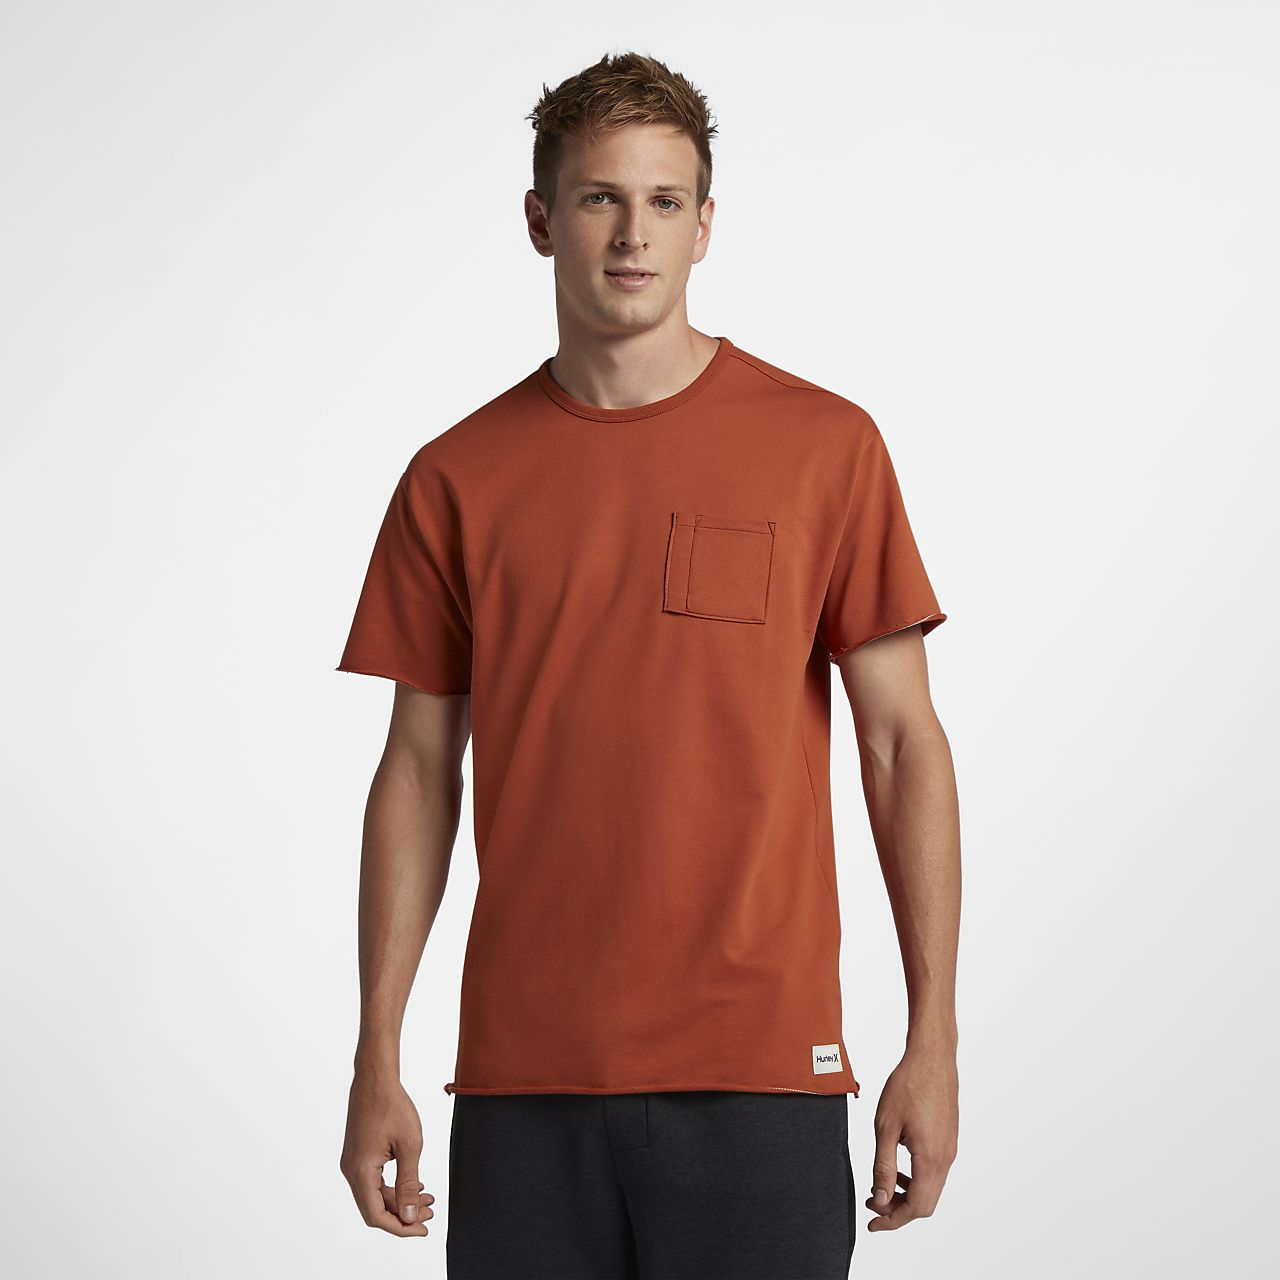 Pánské tričko Hurley L7 Pocket Crew